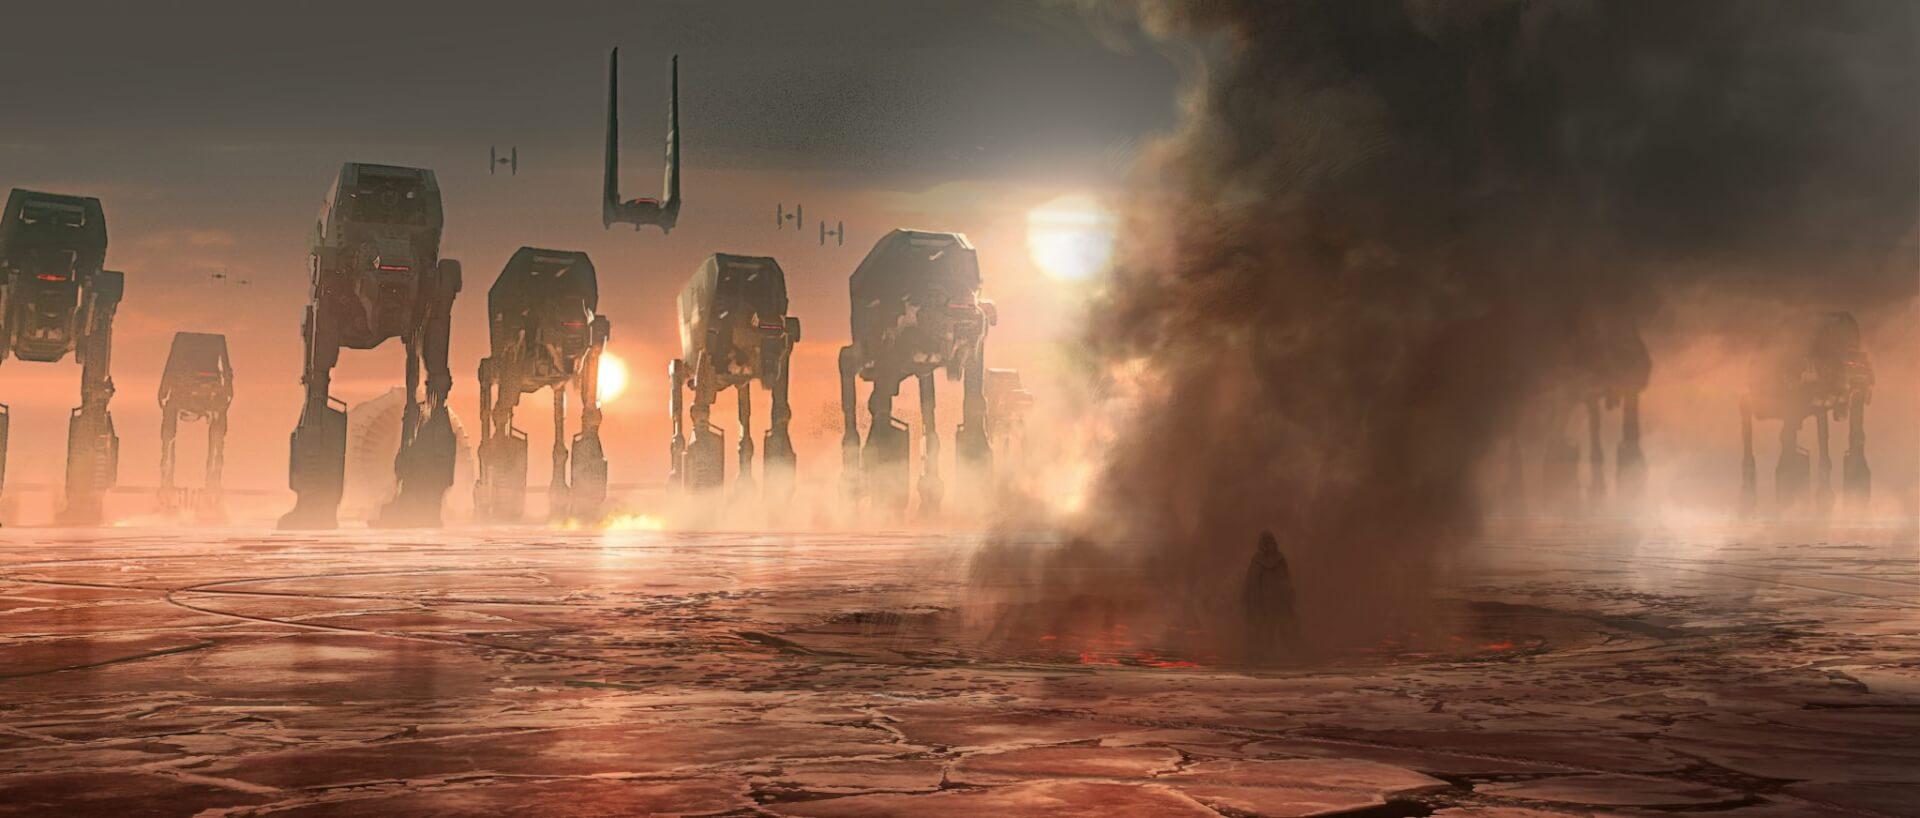 Star Wars The Last Jedi Concept Art